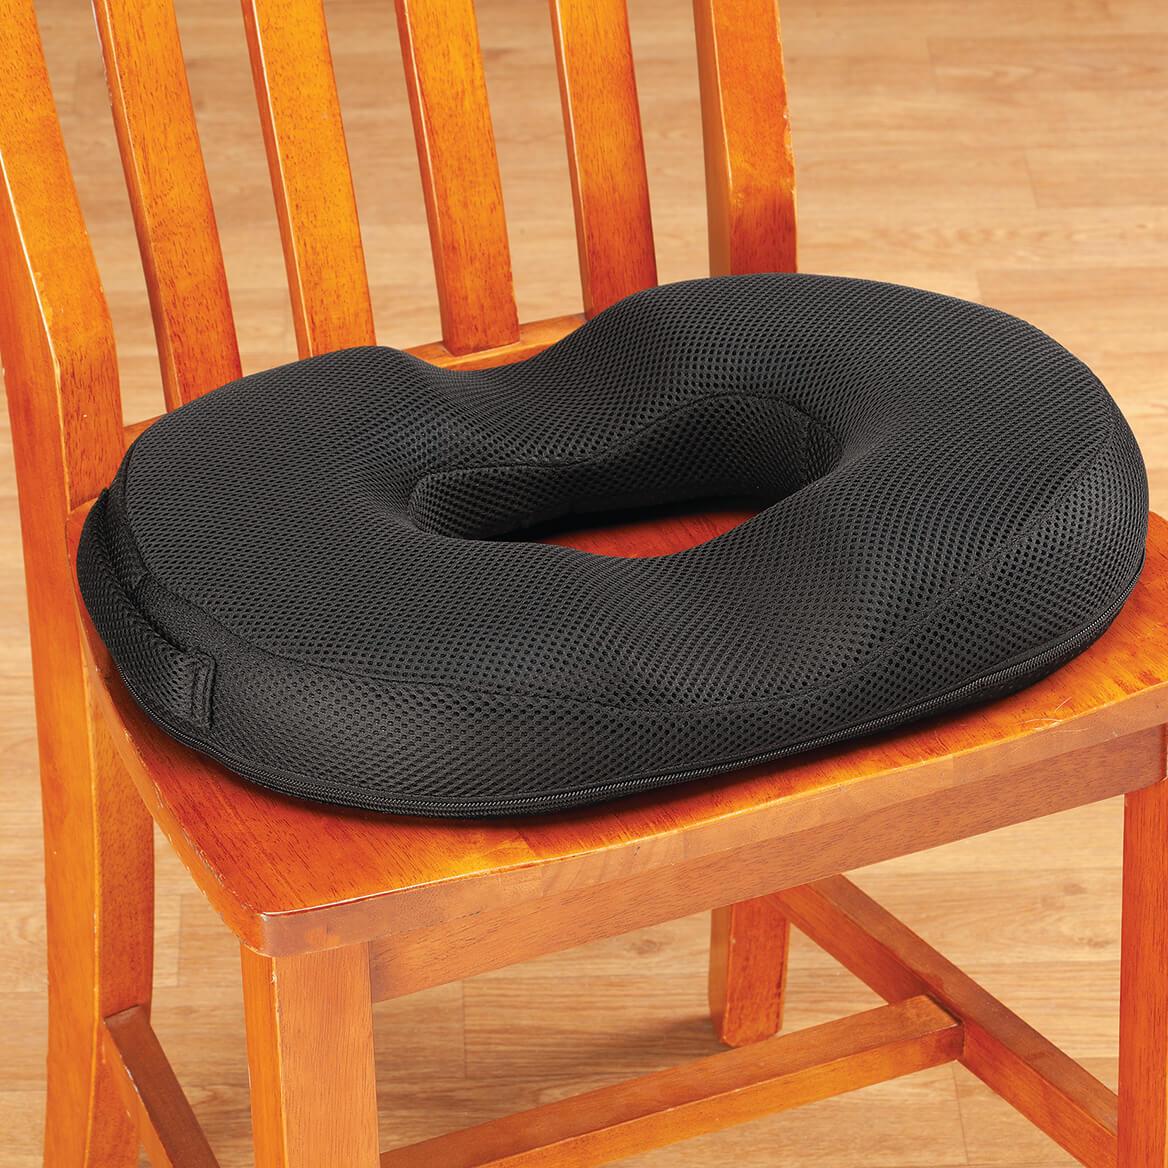 Cool Gel Memory Foam Donut Pillow-369672